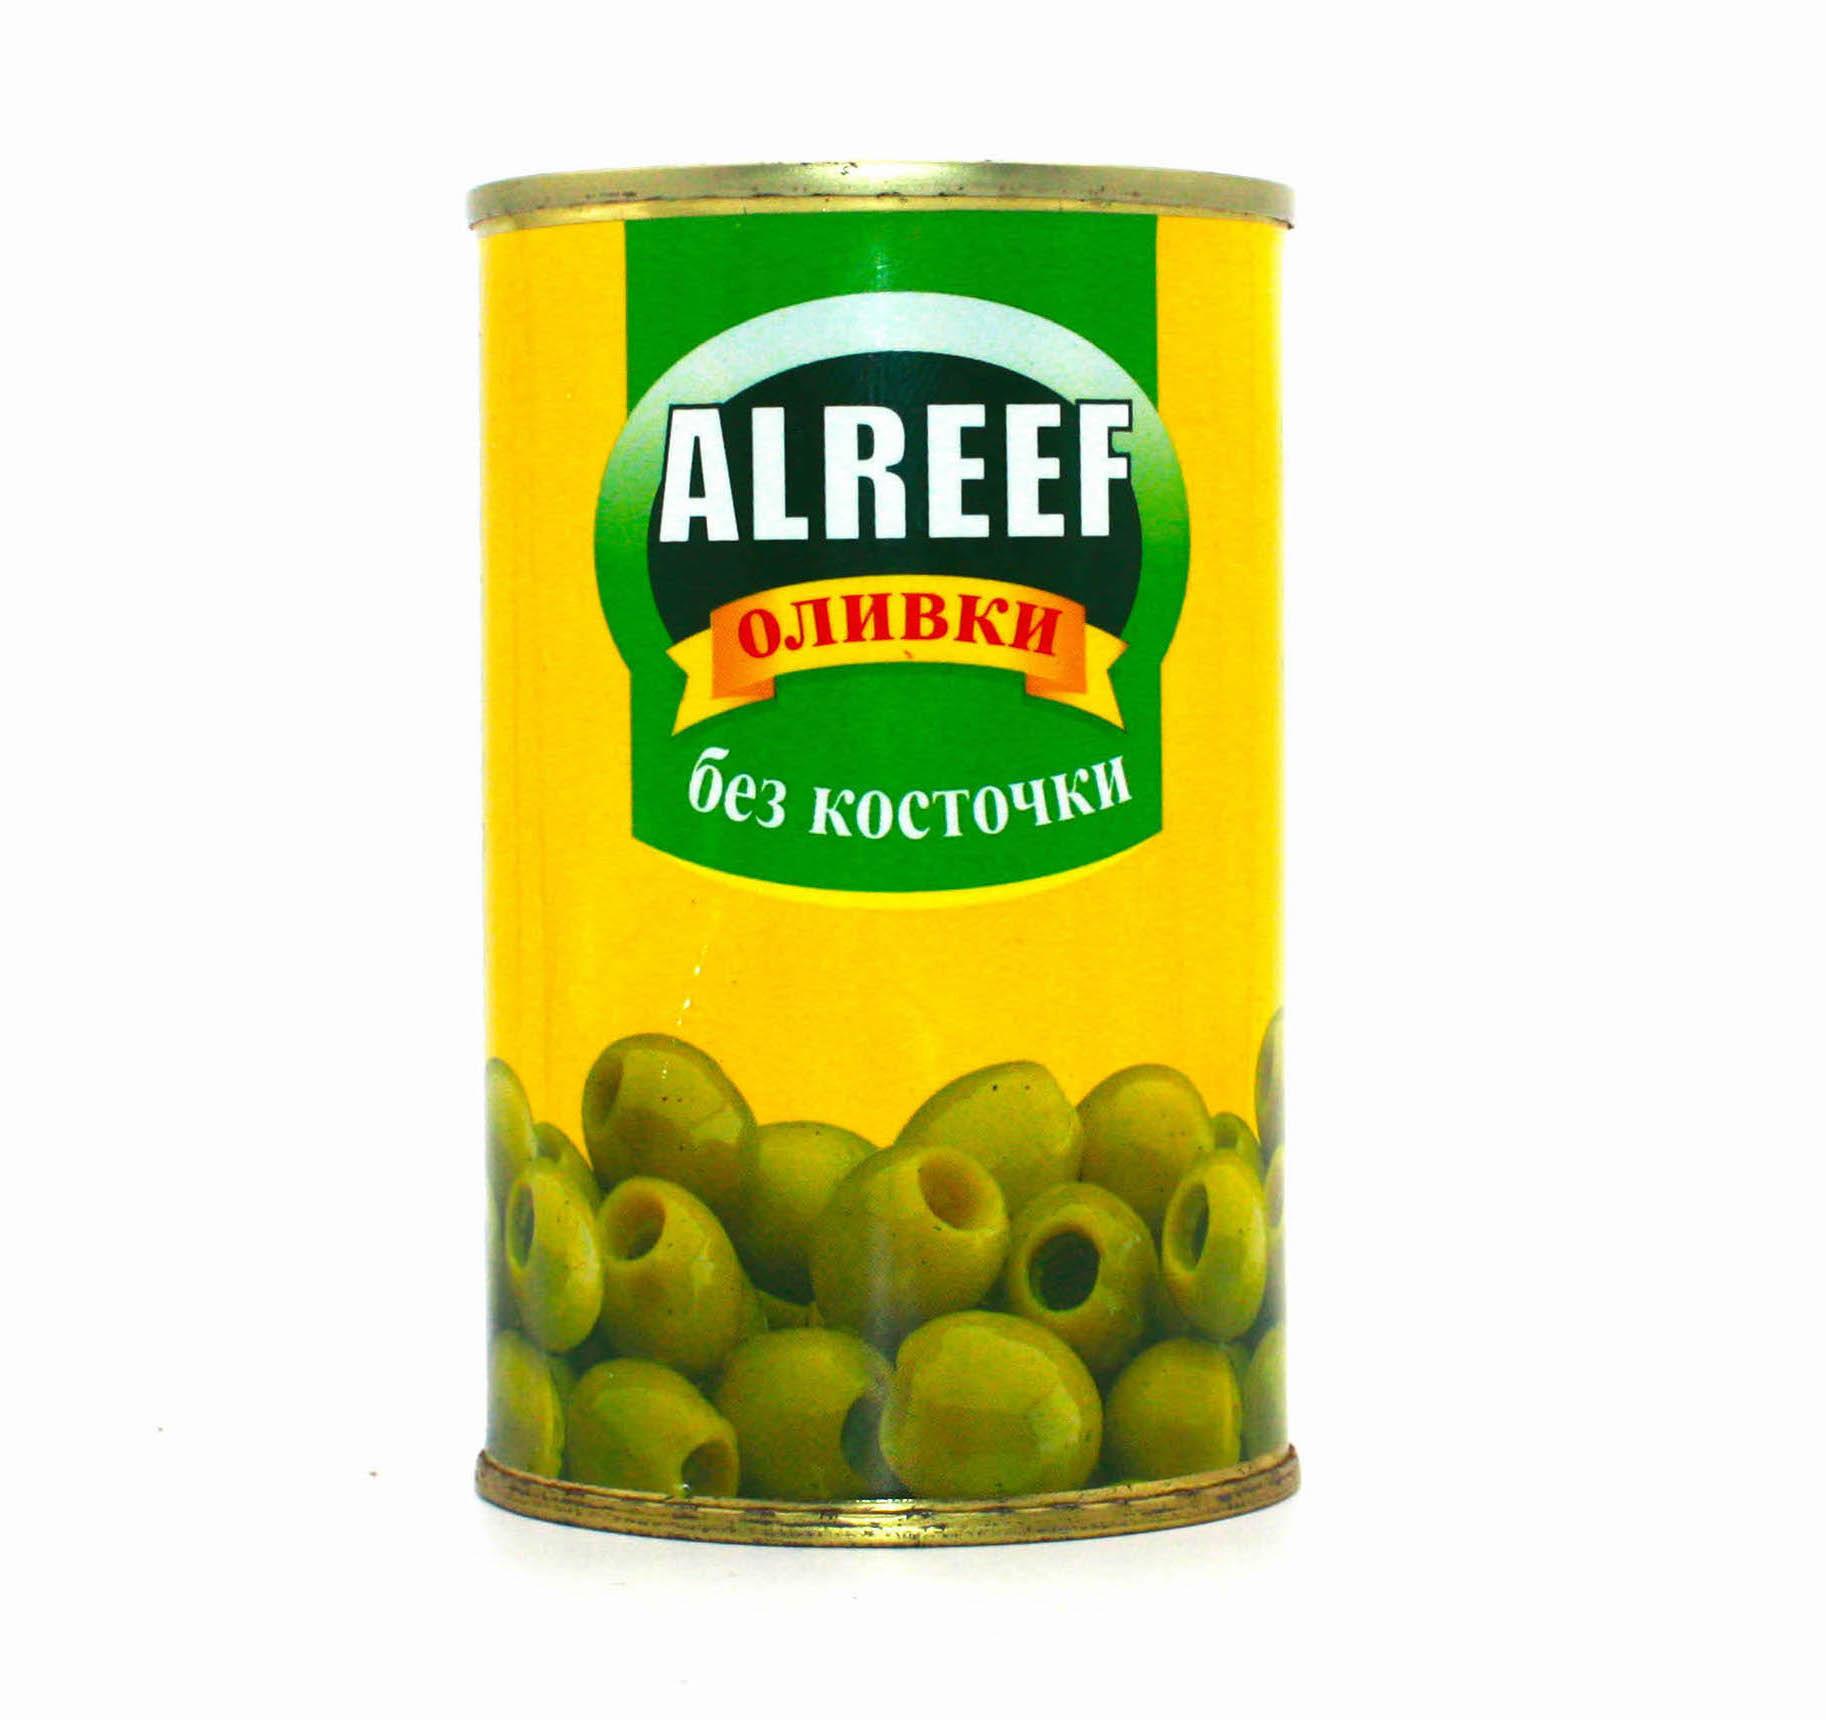 Оливки зеленые Al Reef, 280 г import_files_4b_4be3e0f8ba4d11e8a99c484d7ecee297_d926ffafbfe711e8a99c484d7ecee297.jpg